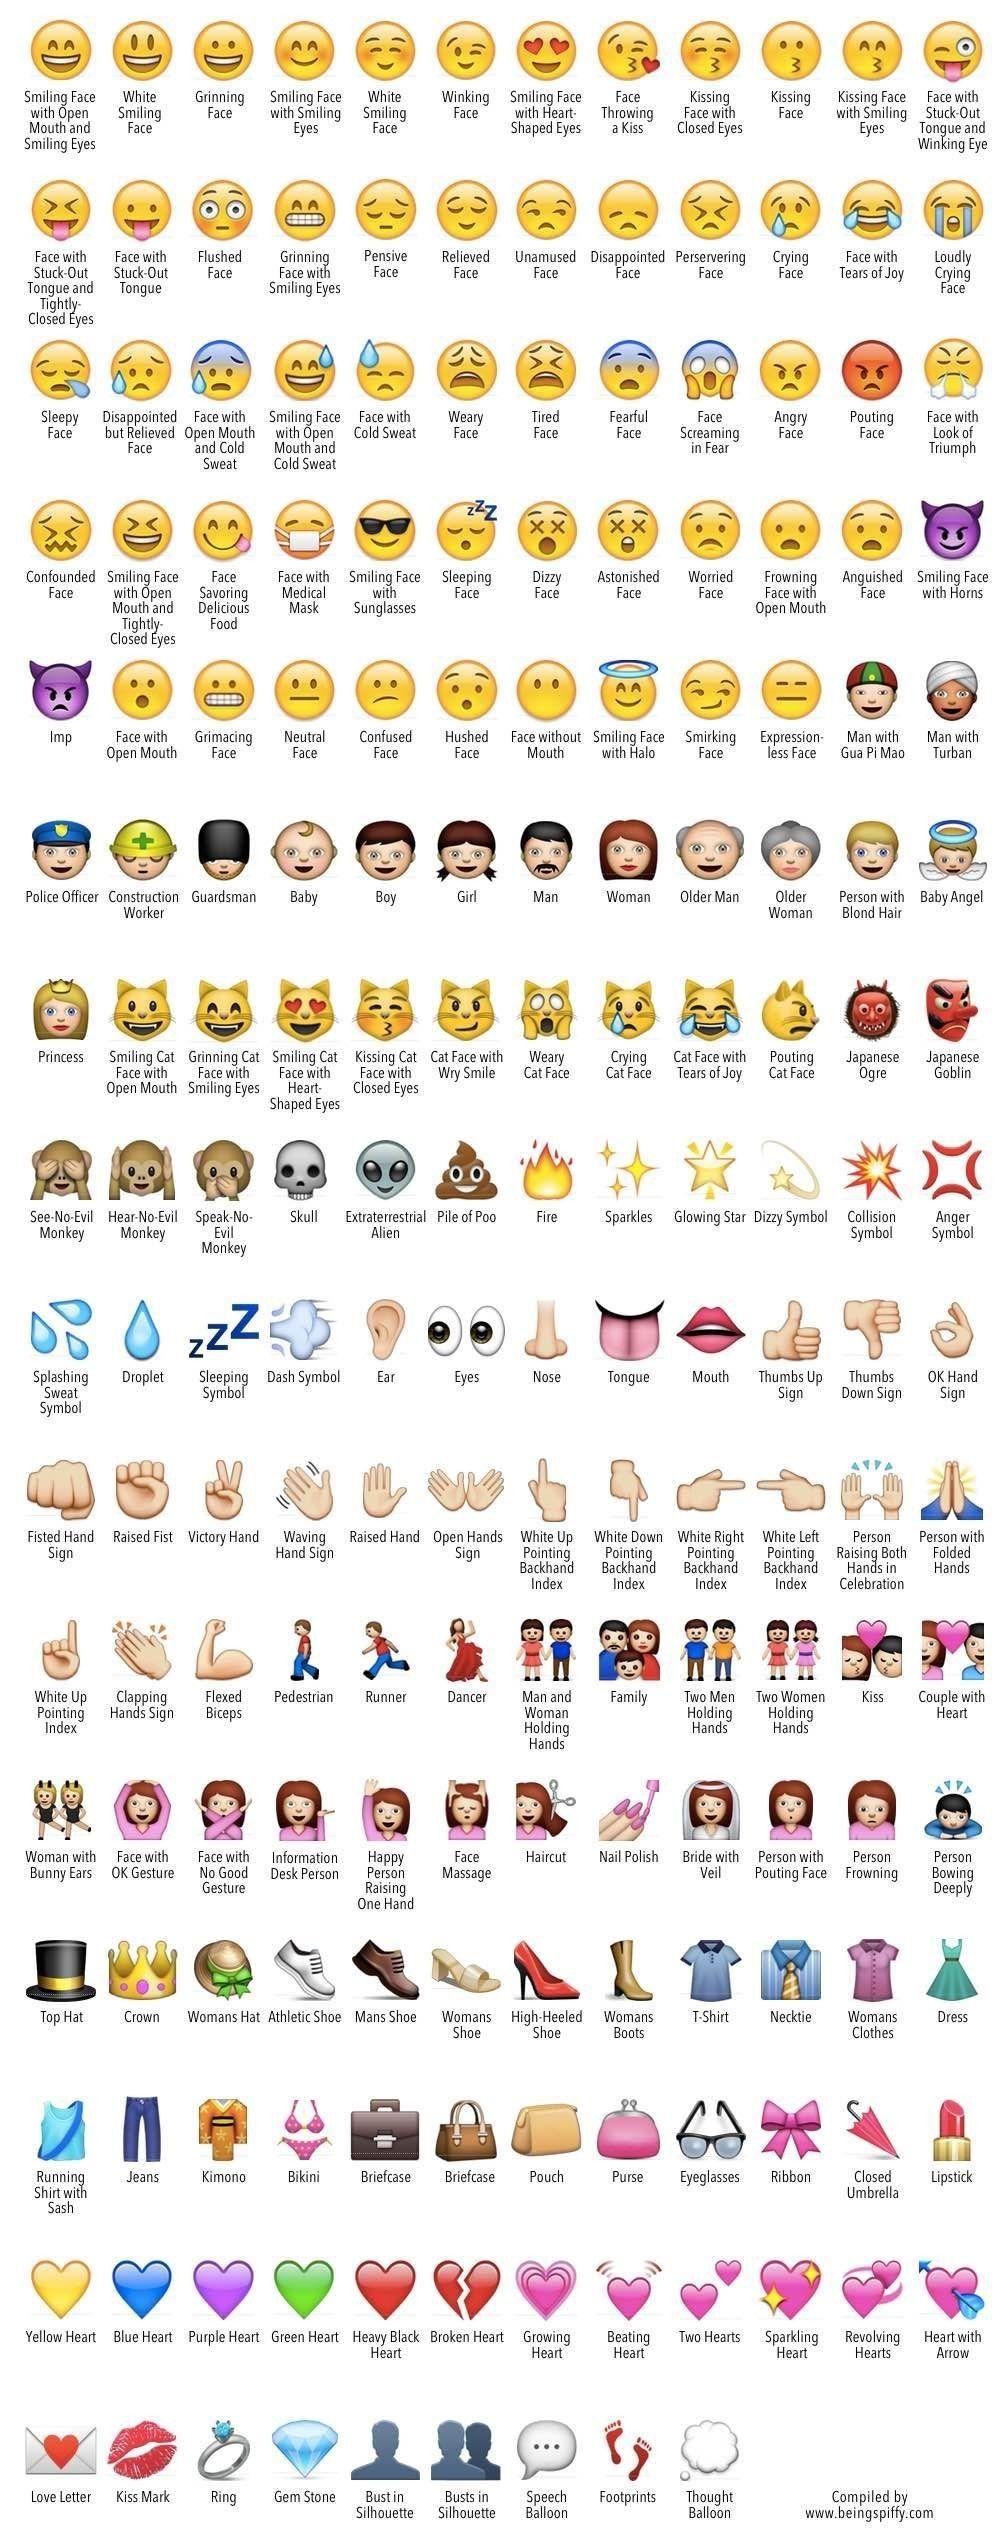 Pin By Sheidars On Pegatinas Emoji Defined Emoji Emoji Pictures